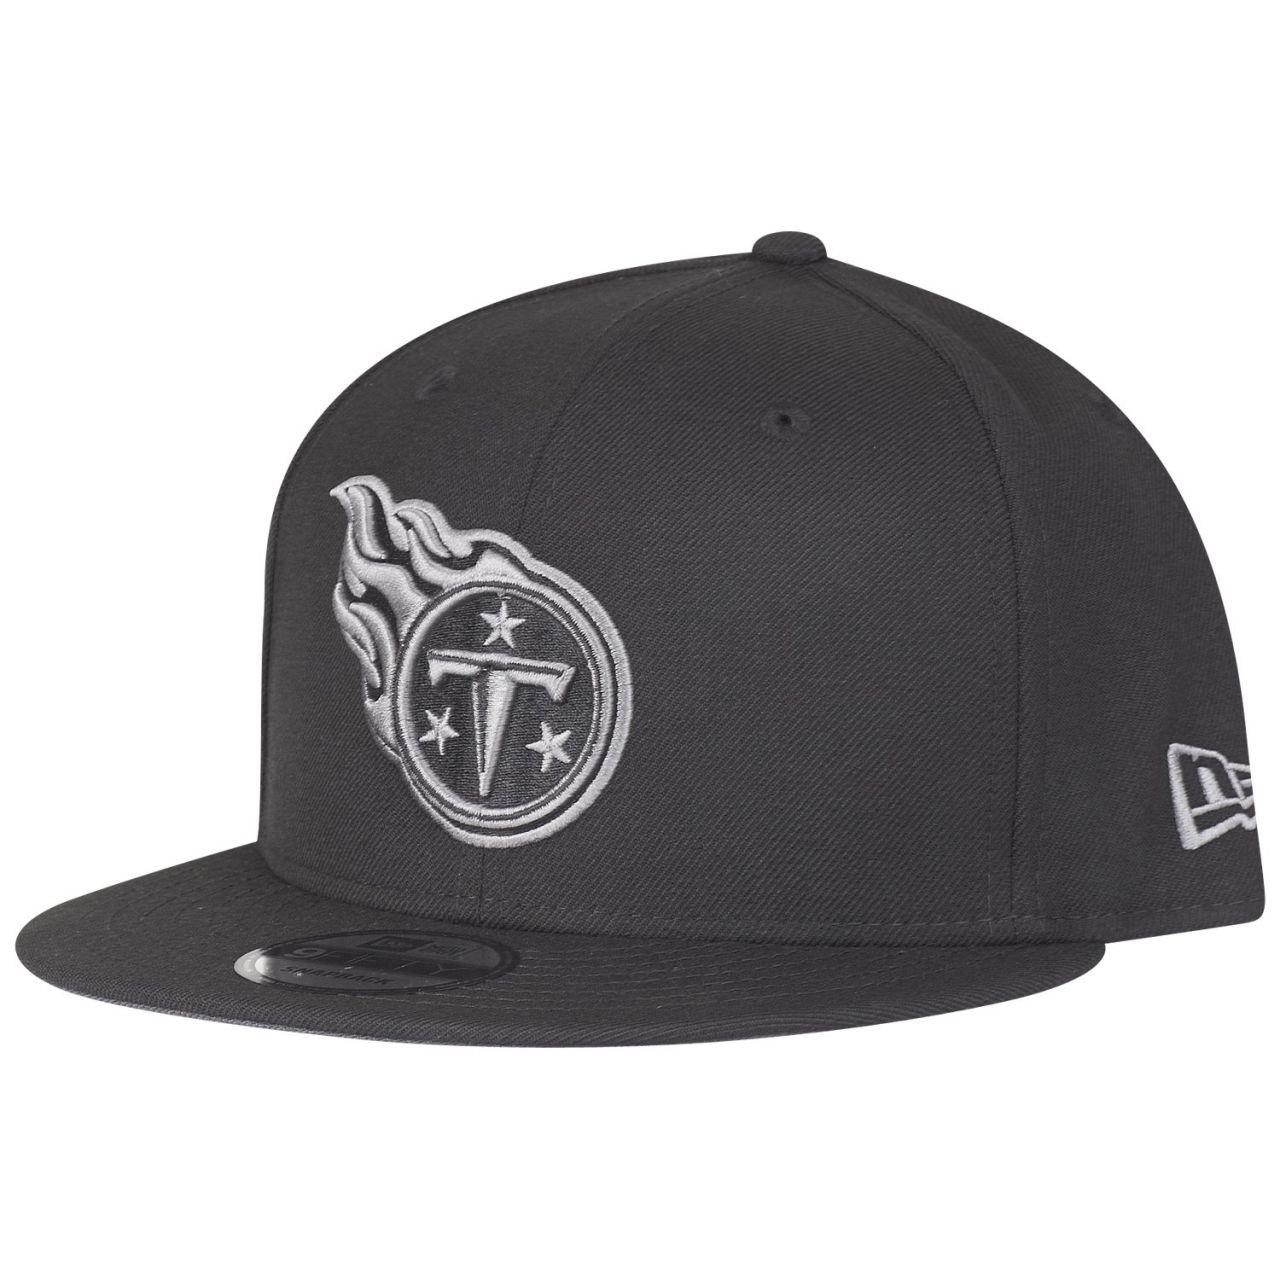 amfoo - New Era 9Fifty Snapback Cap - Tennessee Titans schwarz grau